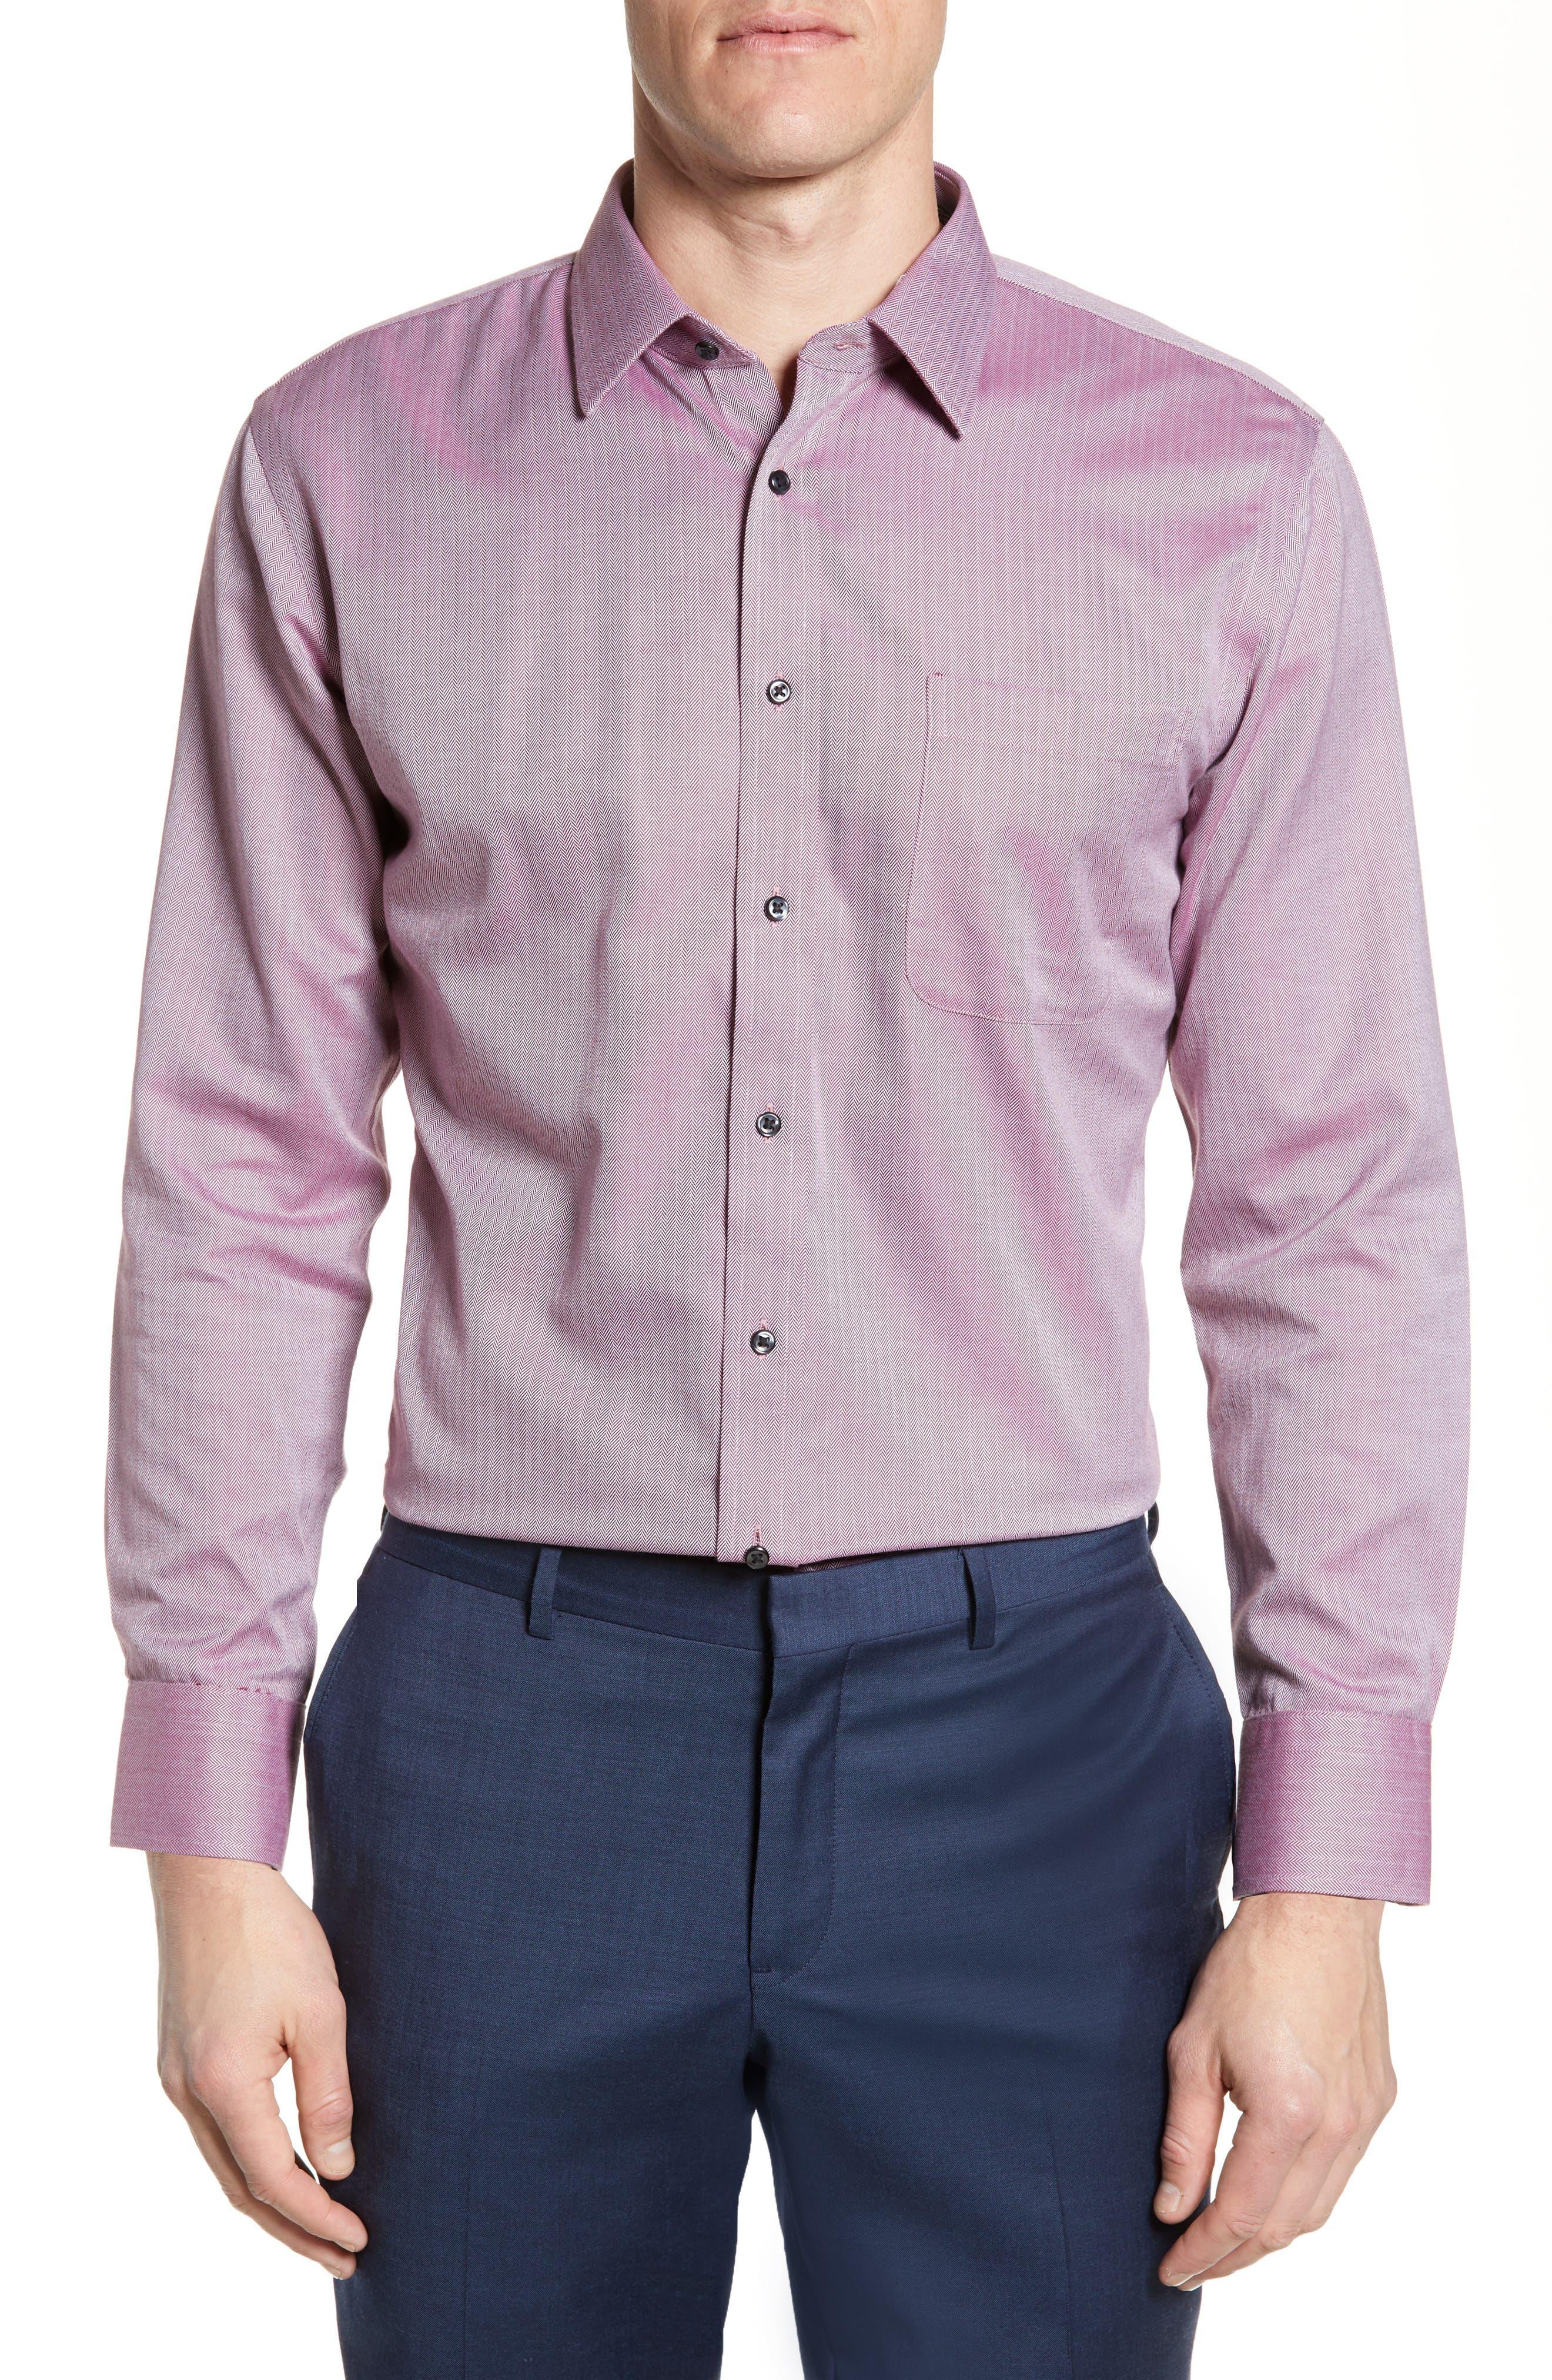 Nordstrom Shop Smartcare(TM) Trim Fit Herringbone Dress Shirt - Burgundy